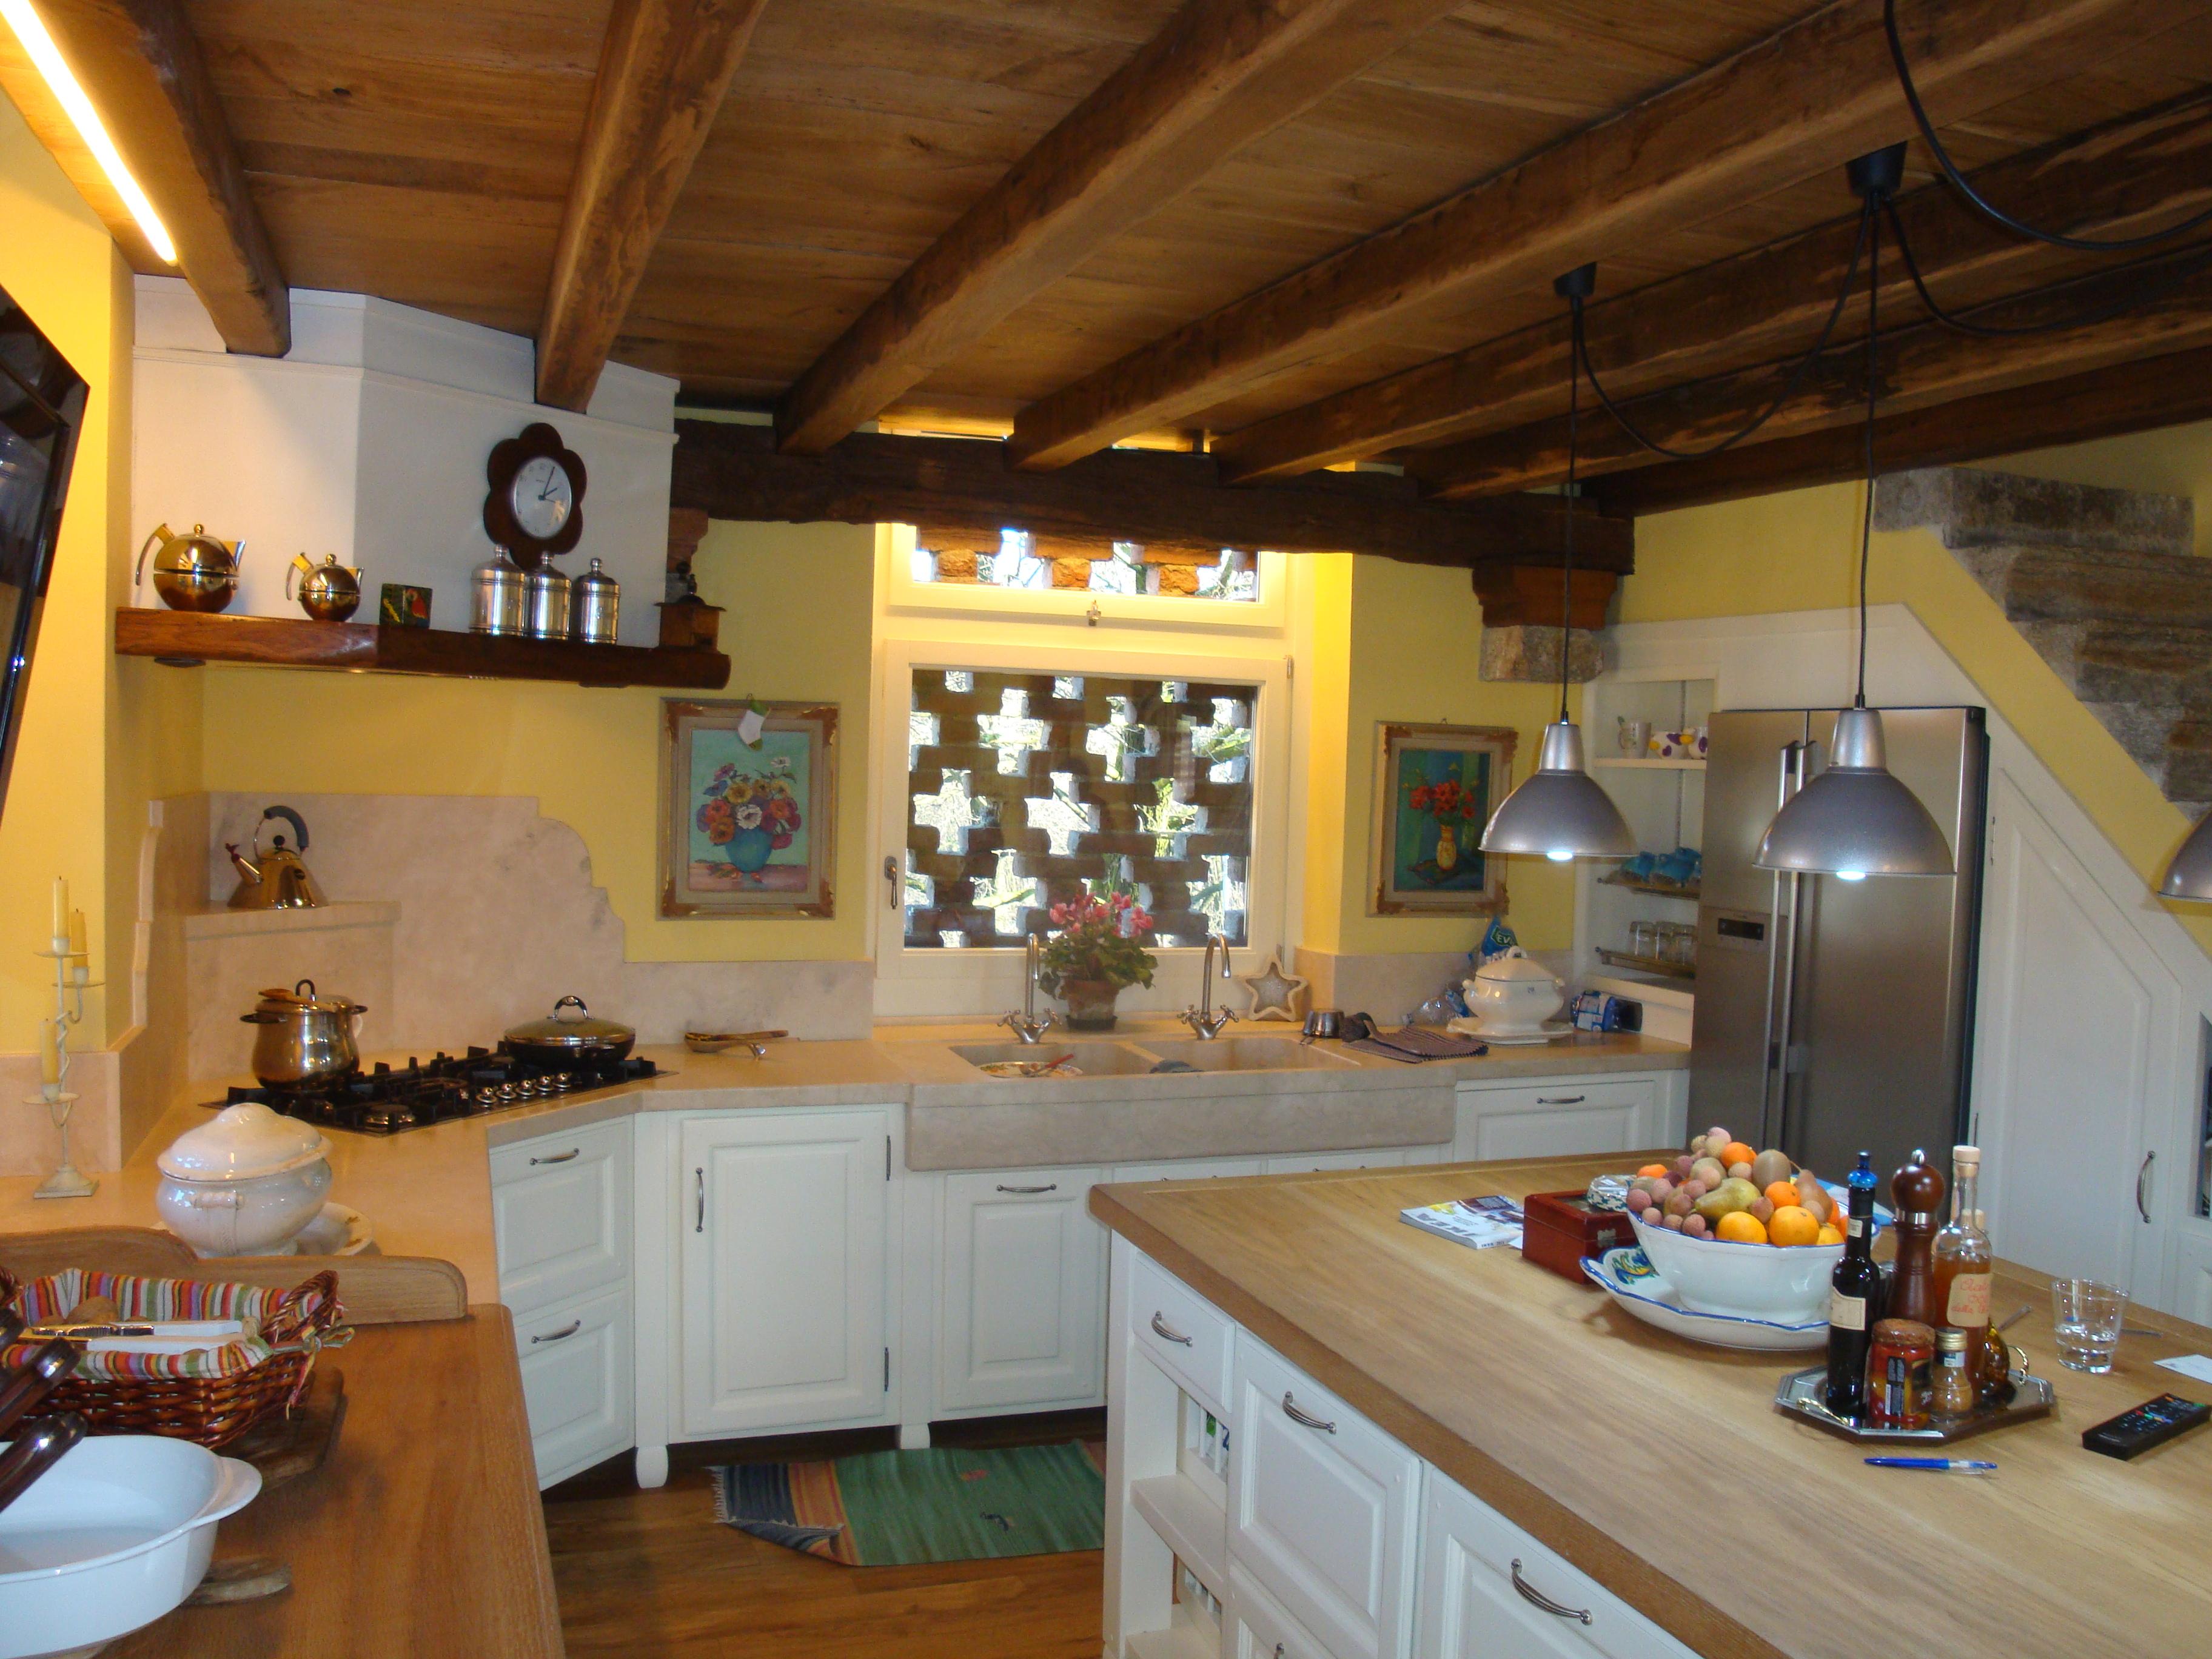 Cucine Toscane In Muratura. Beautiful Gallery With Cucine Toscane In ...